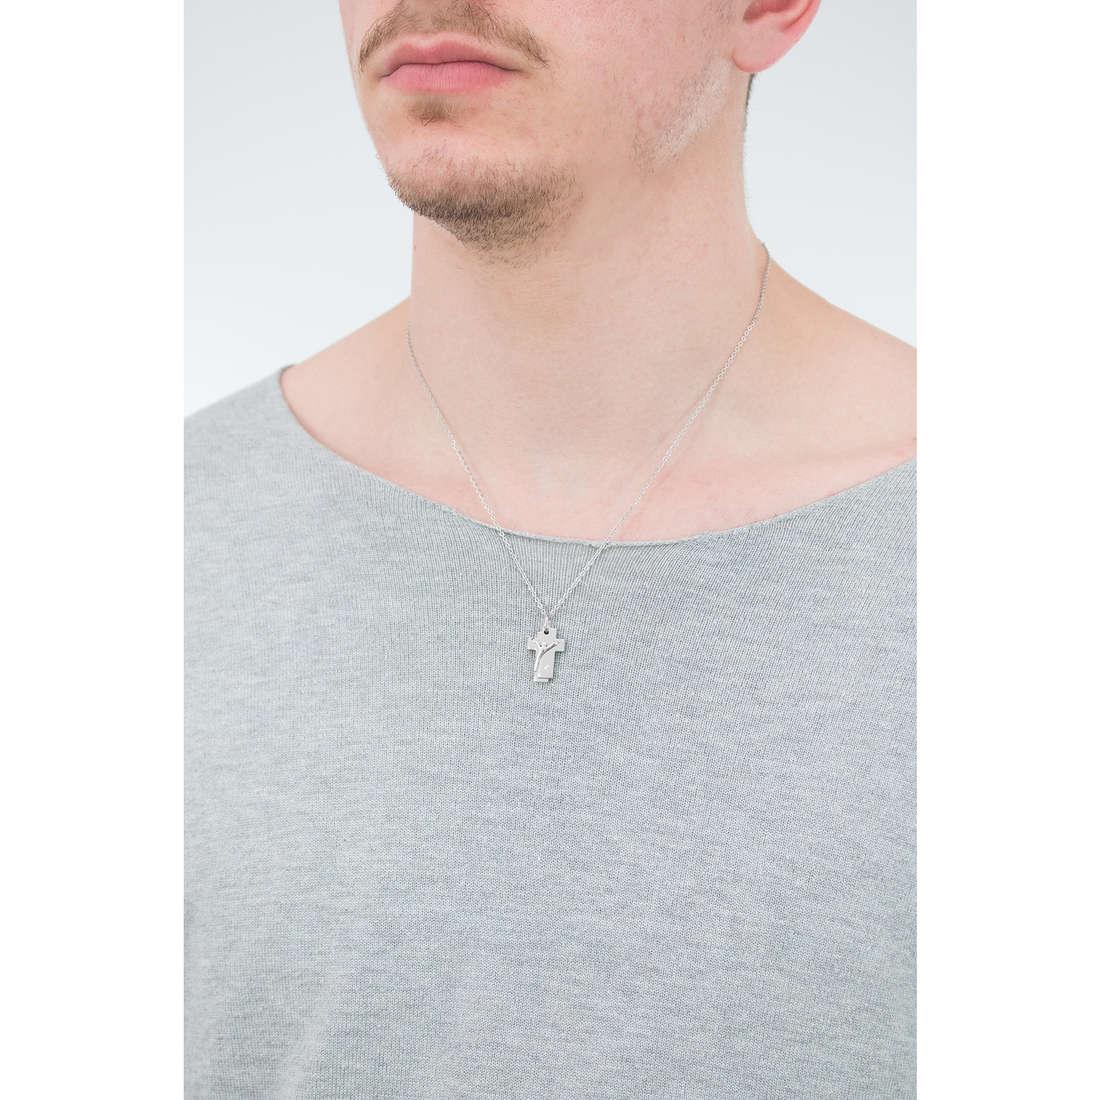 Luca Barra necklaces man LBCA326 photo wearing